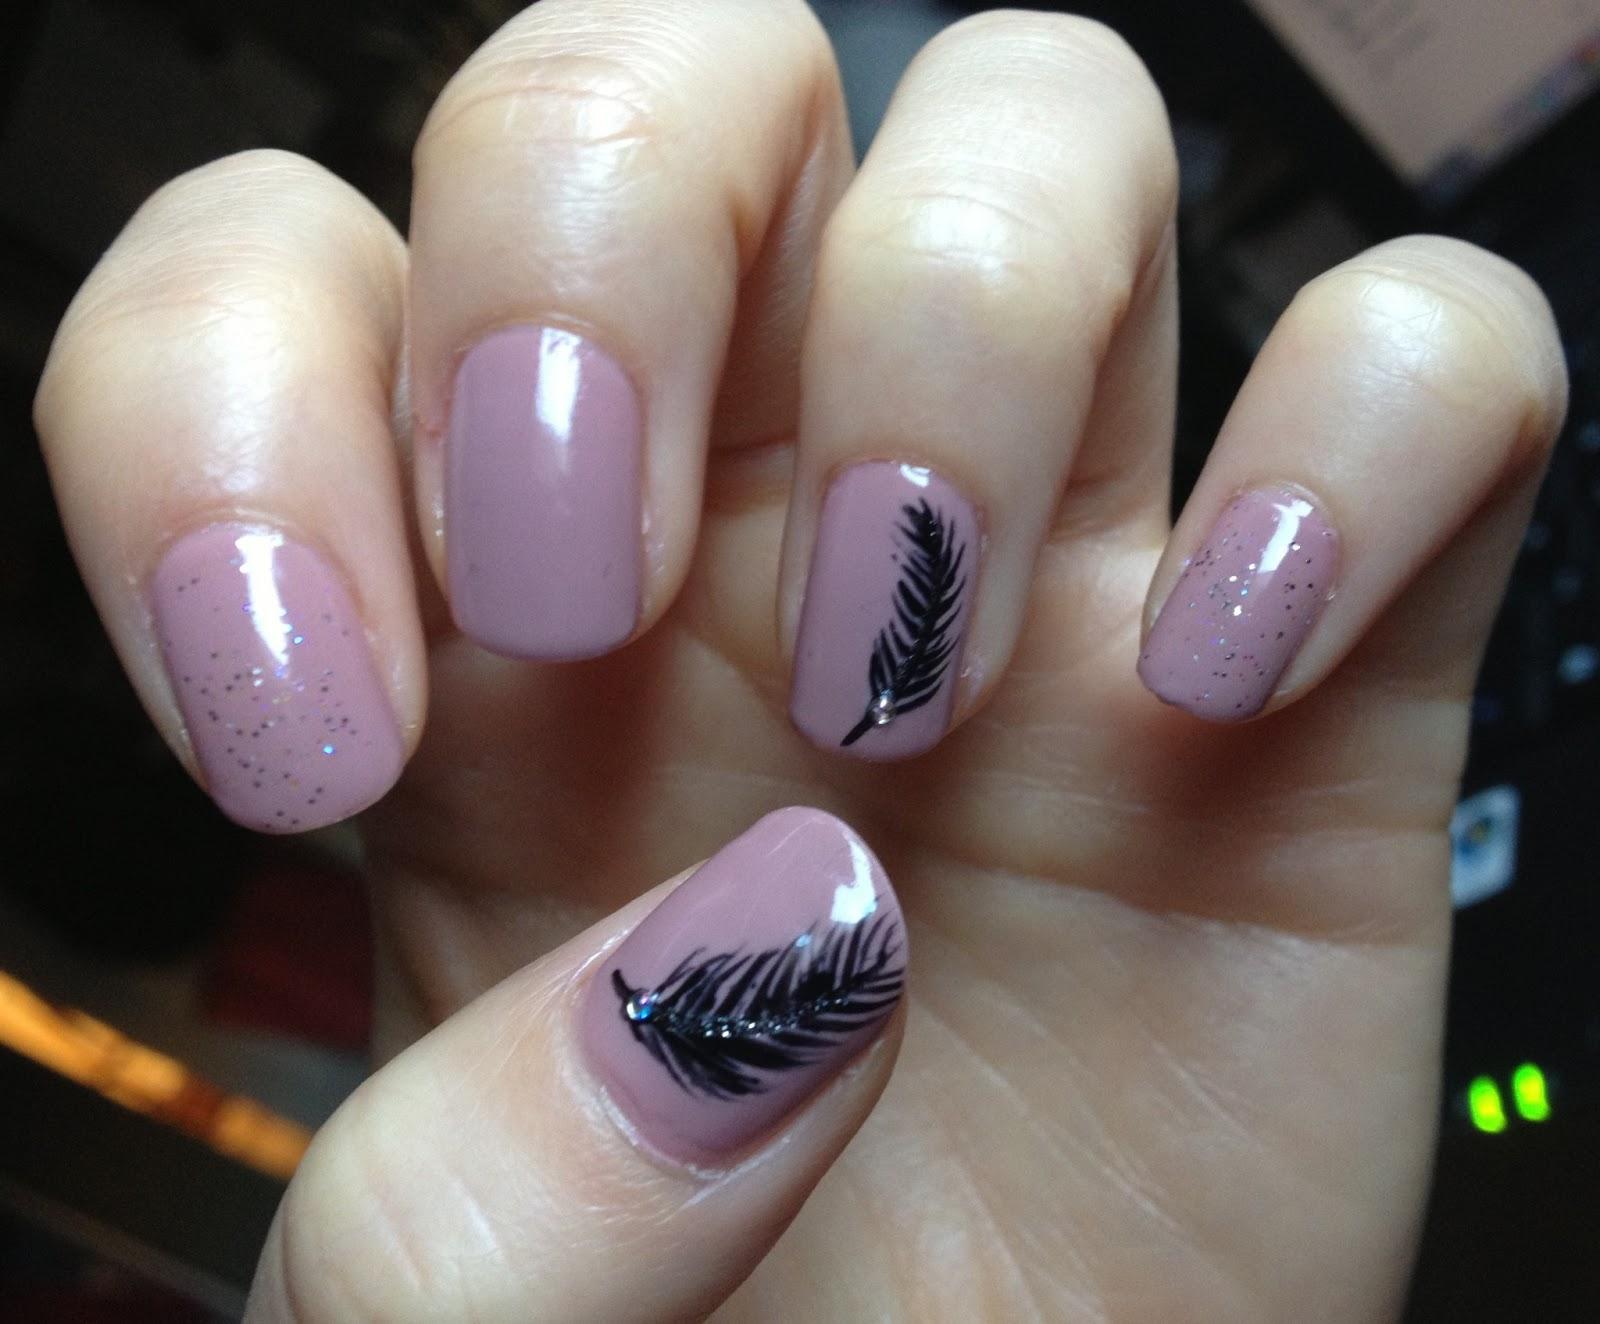 Puddle Splashin\': Nails- Feathers, Jeweled Mint, Expanding Circles